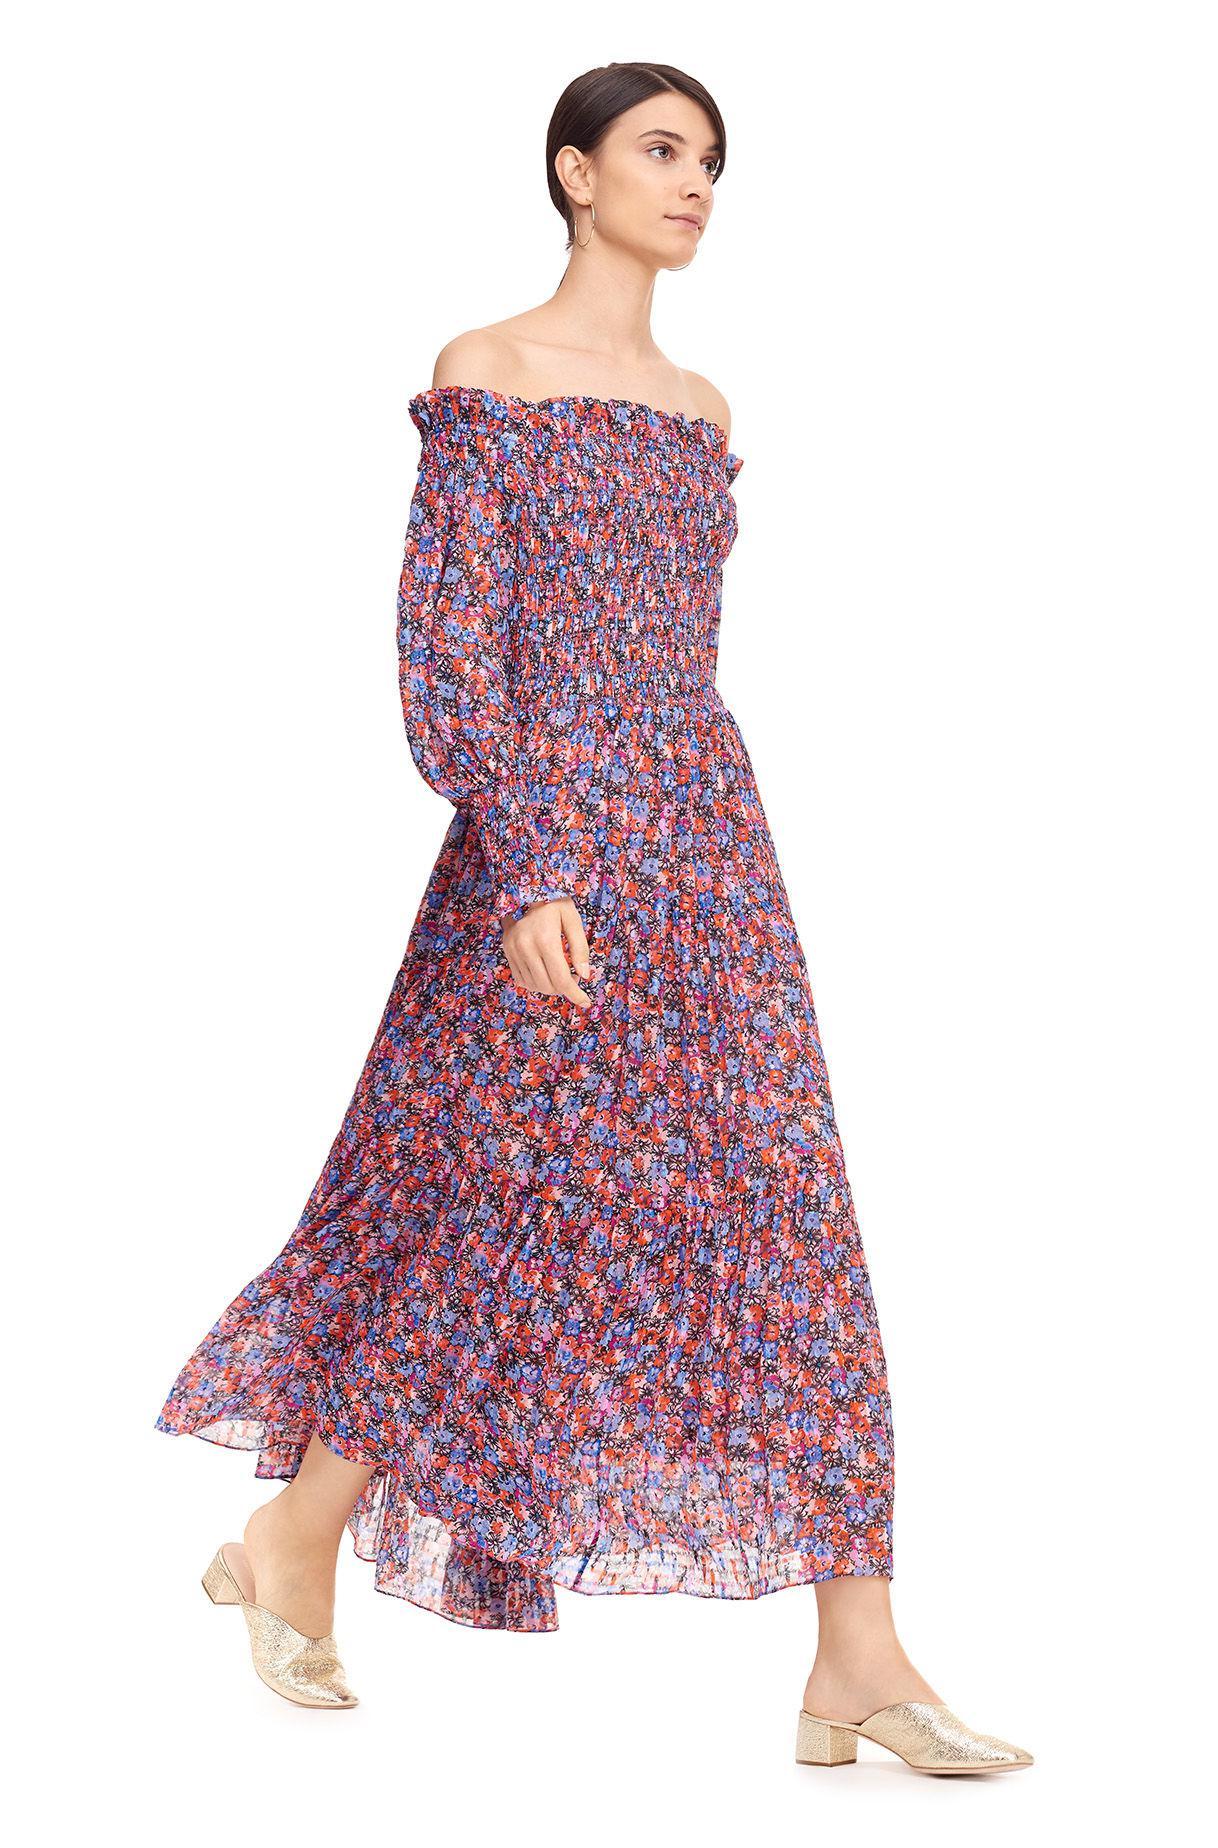 930e28db2d0f Rebecca Taylor Off-the-shoulder Cosmic Fleur Print Dress - Lyst